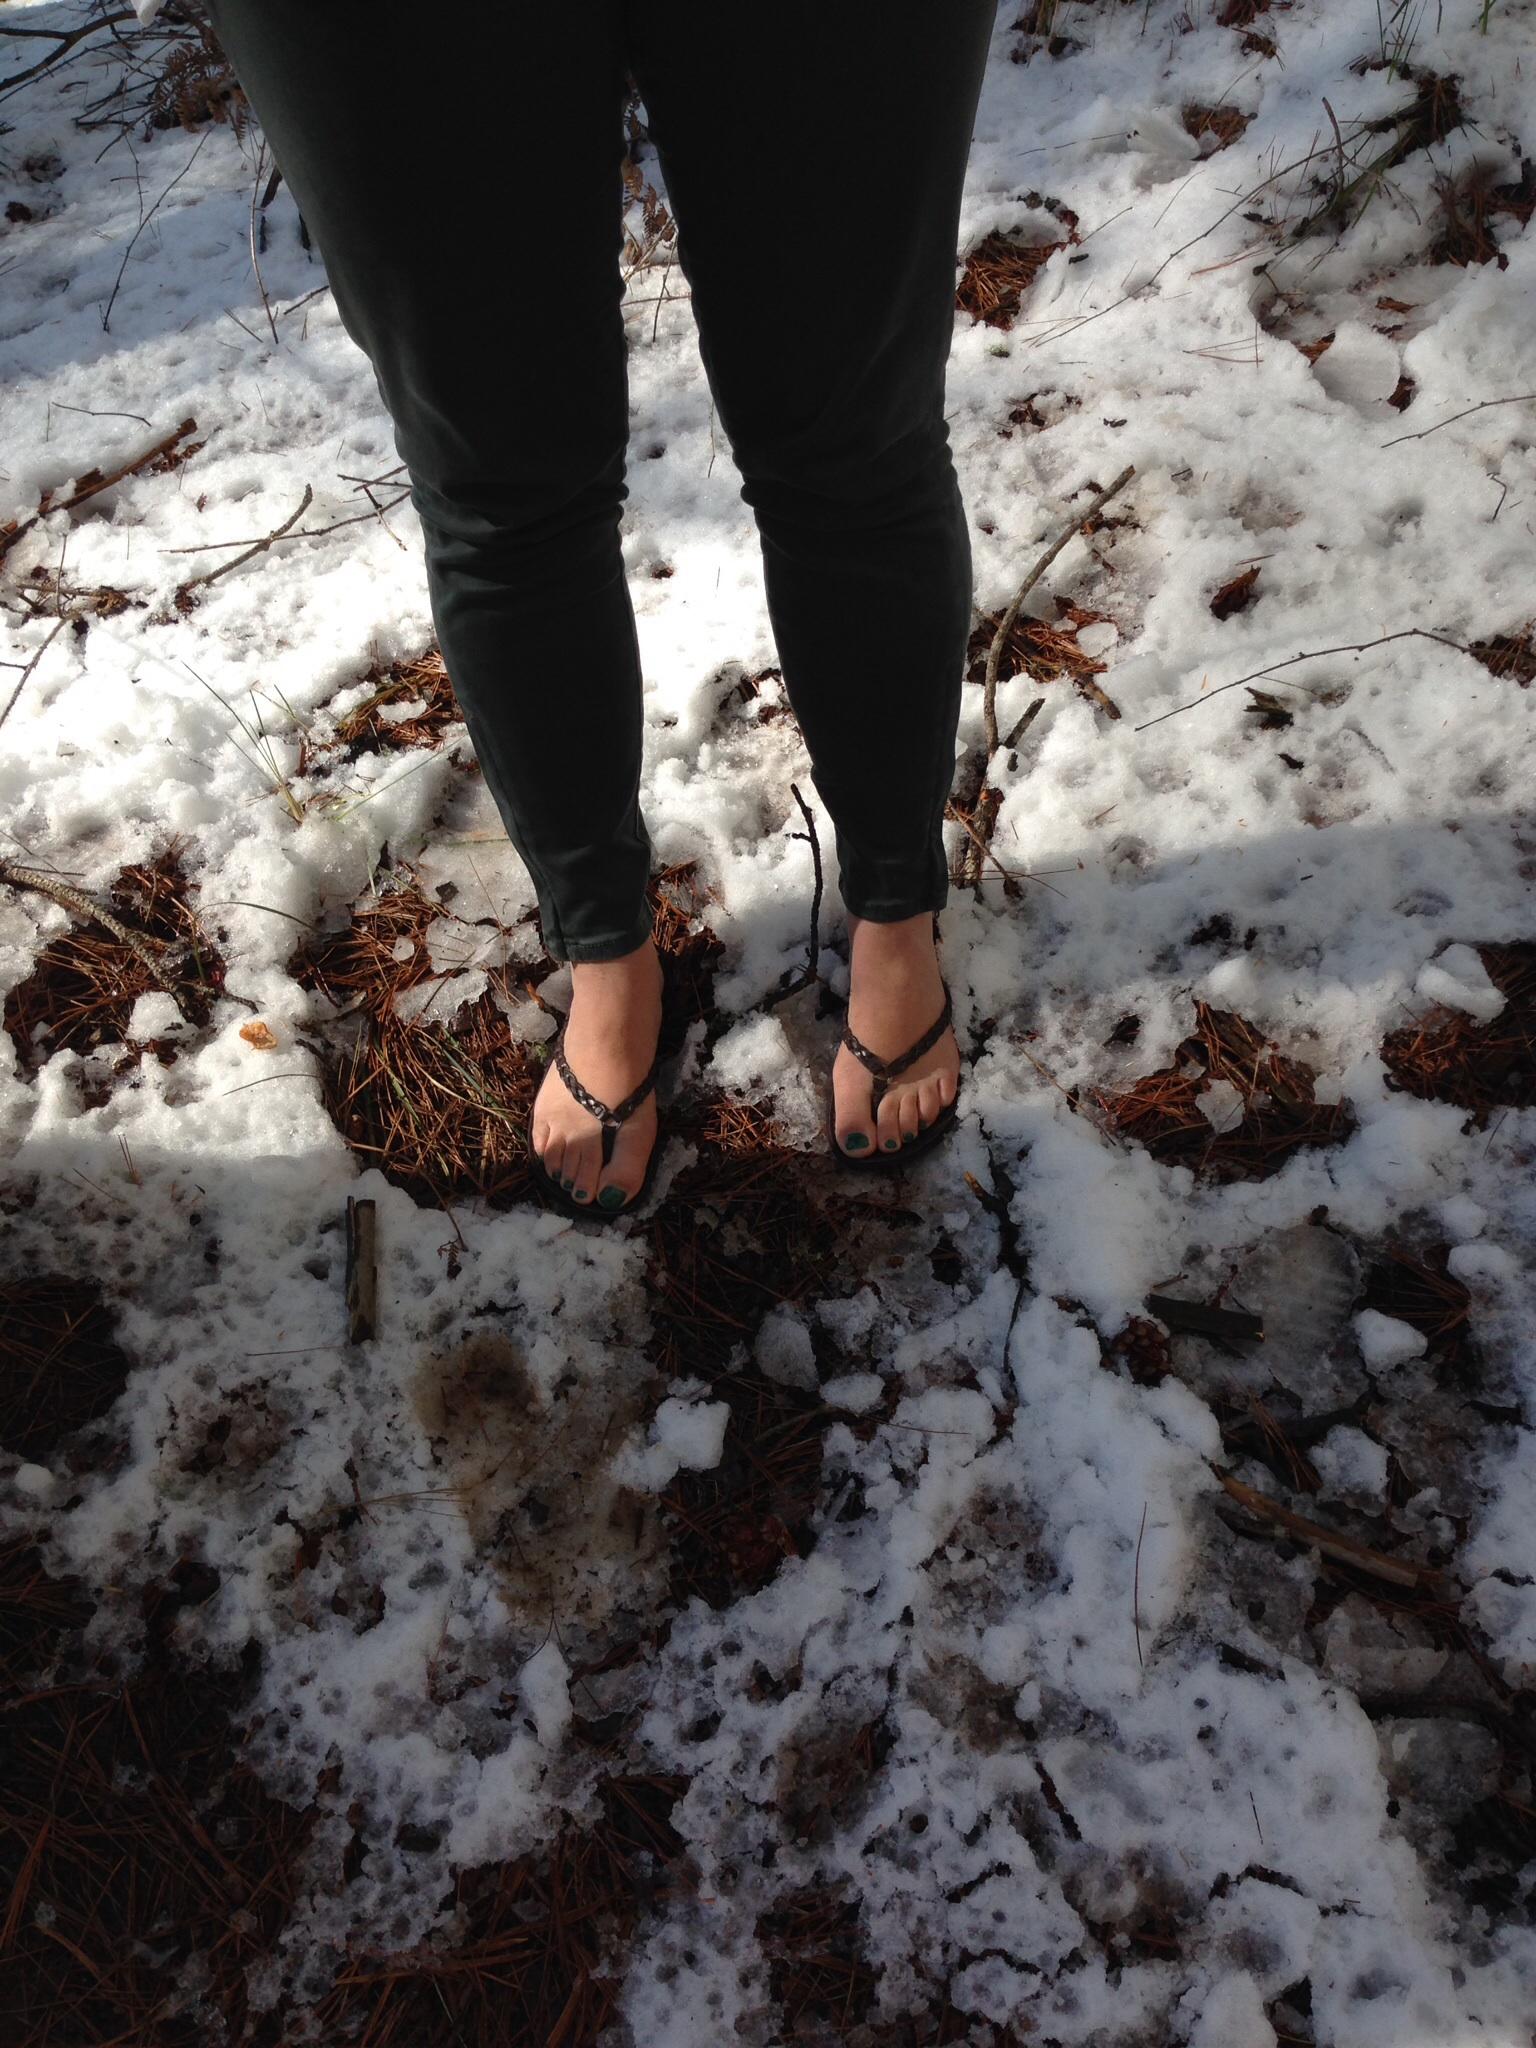 Sugar Pine walk in the snow with flip flops